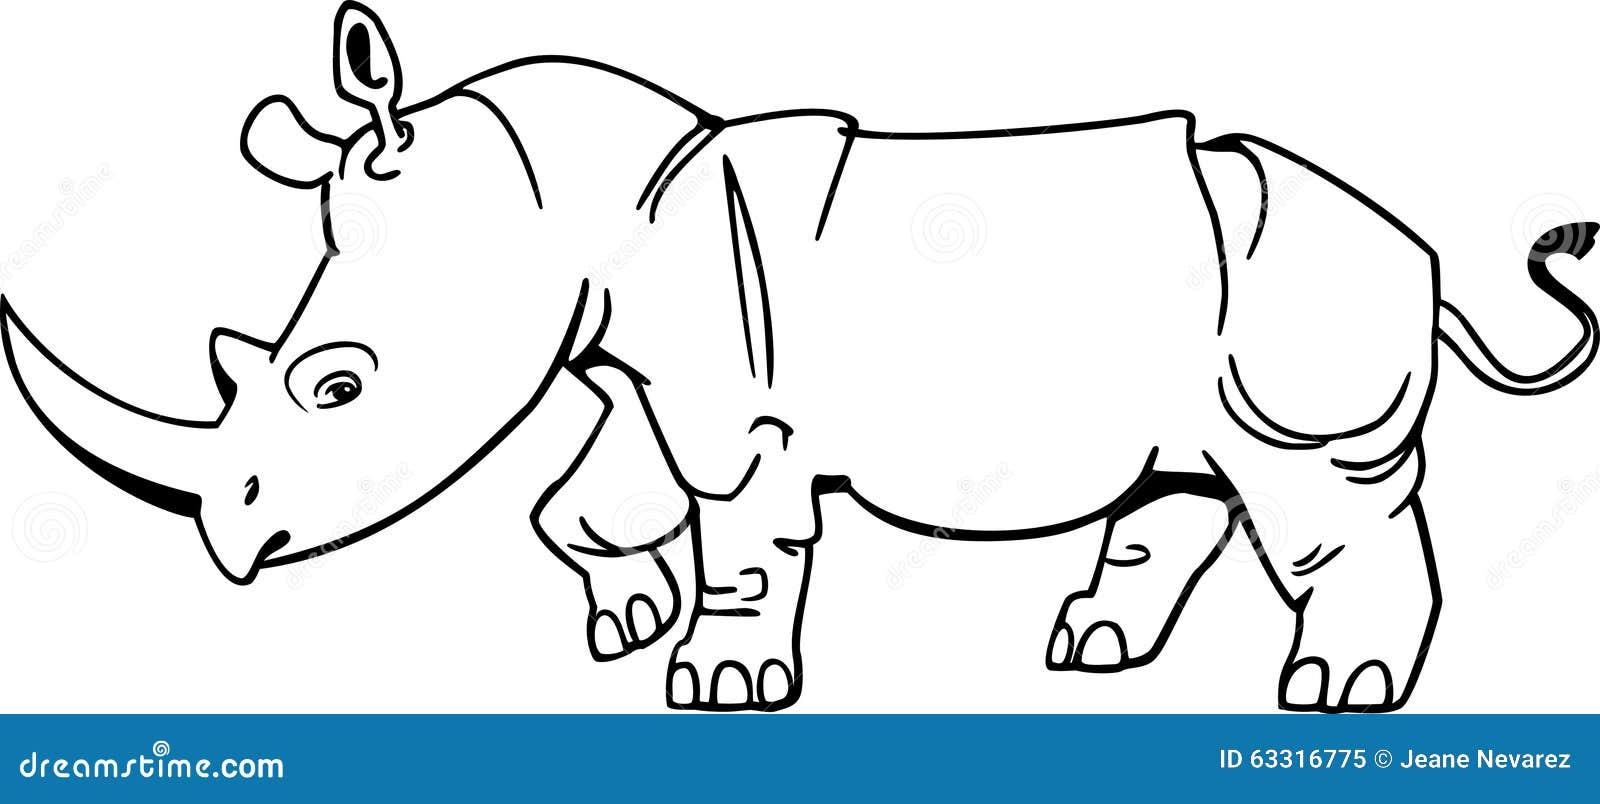 Line Drawing Rhino : Rhinocerotidae cartoons illustrations vector stock